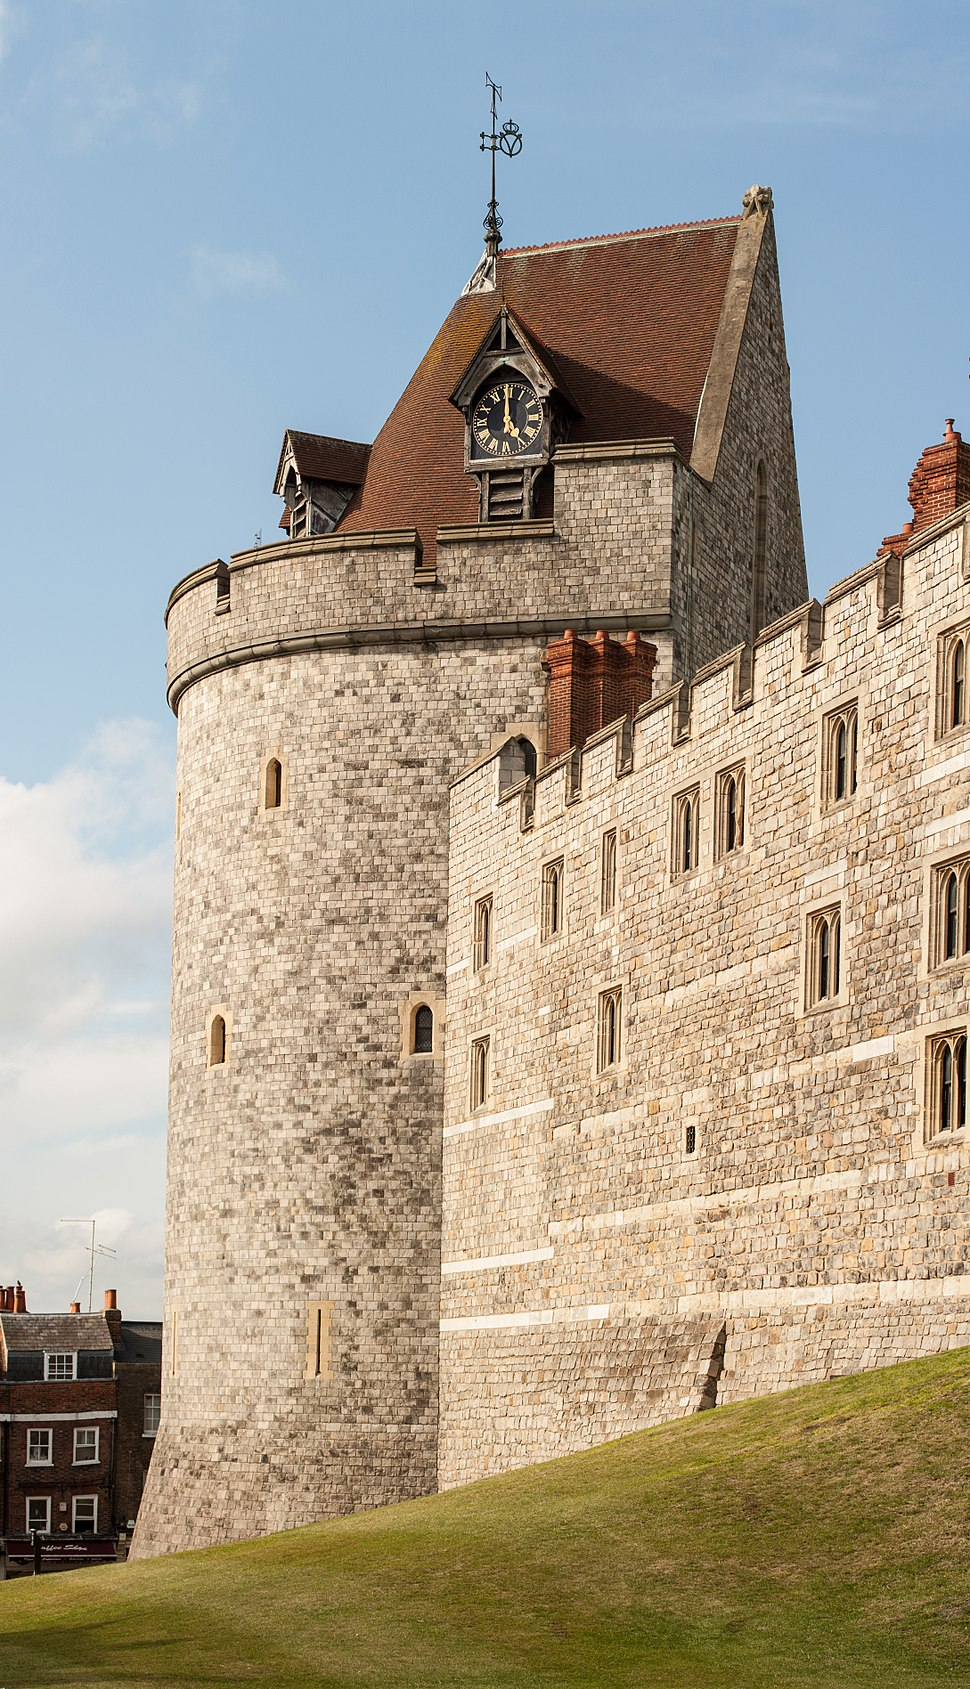 Curfew Tower, Windsor Castle